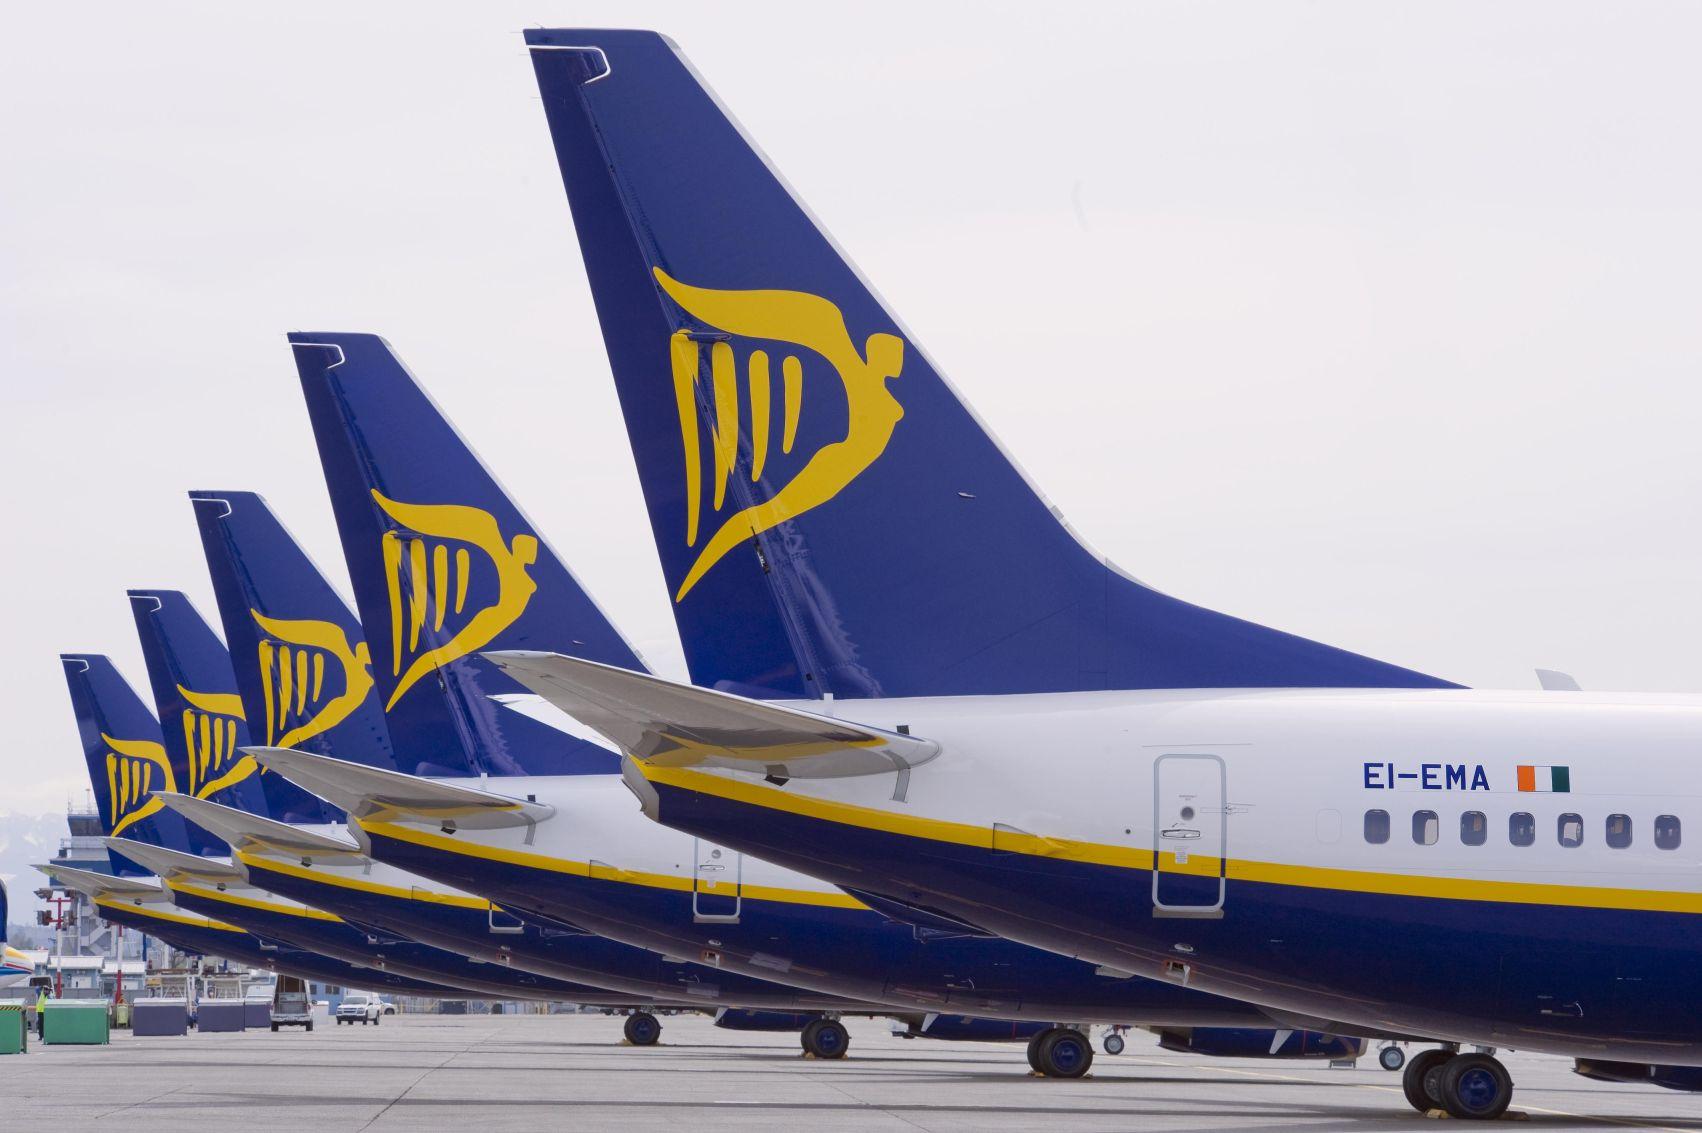 A Ryanair jelenleg kizárólag 737-esekkel repül